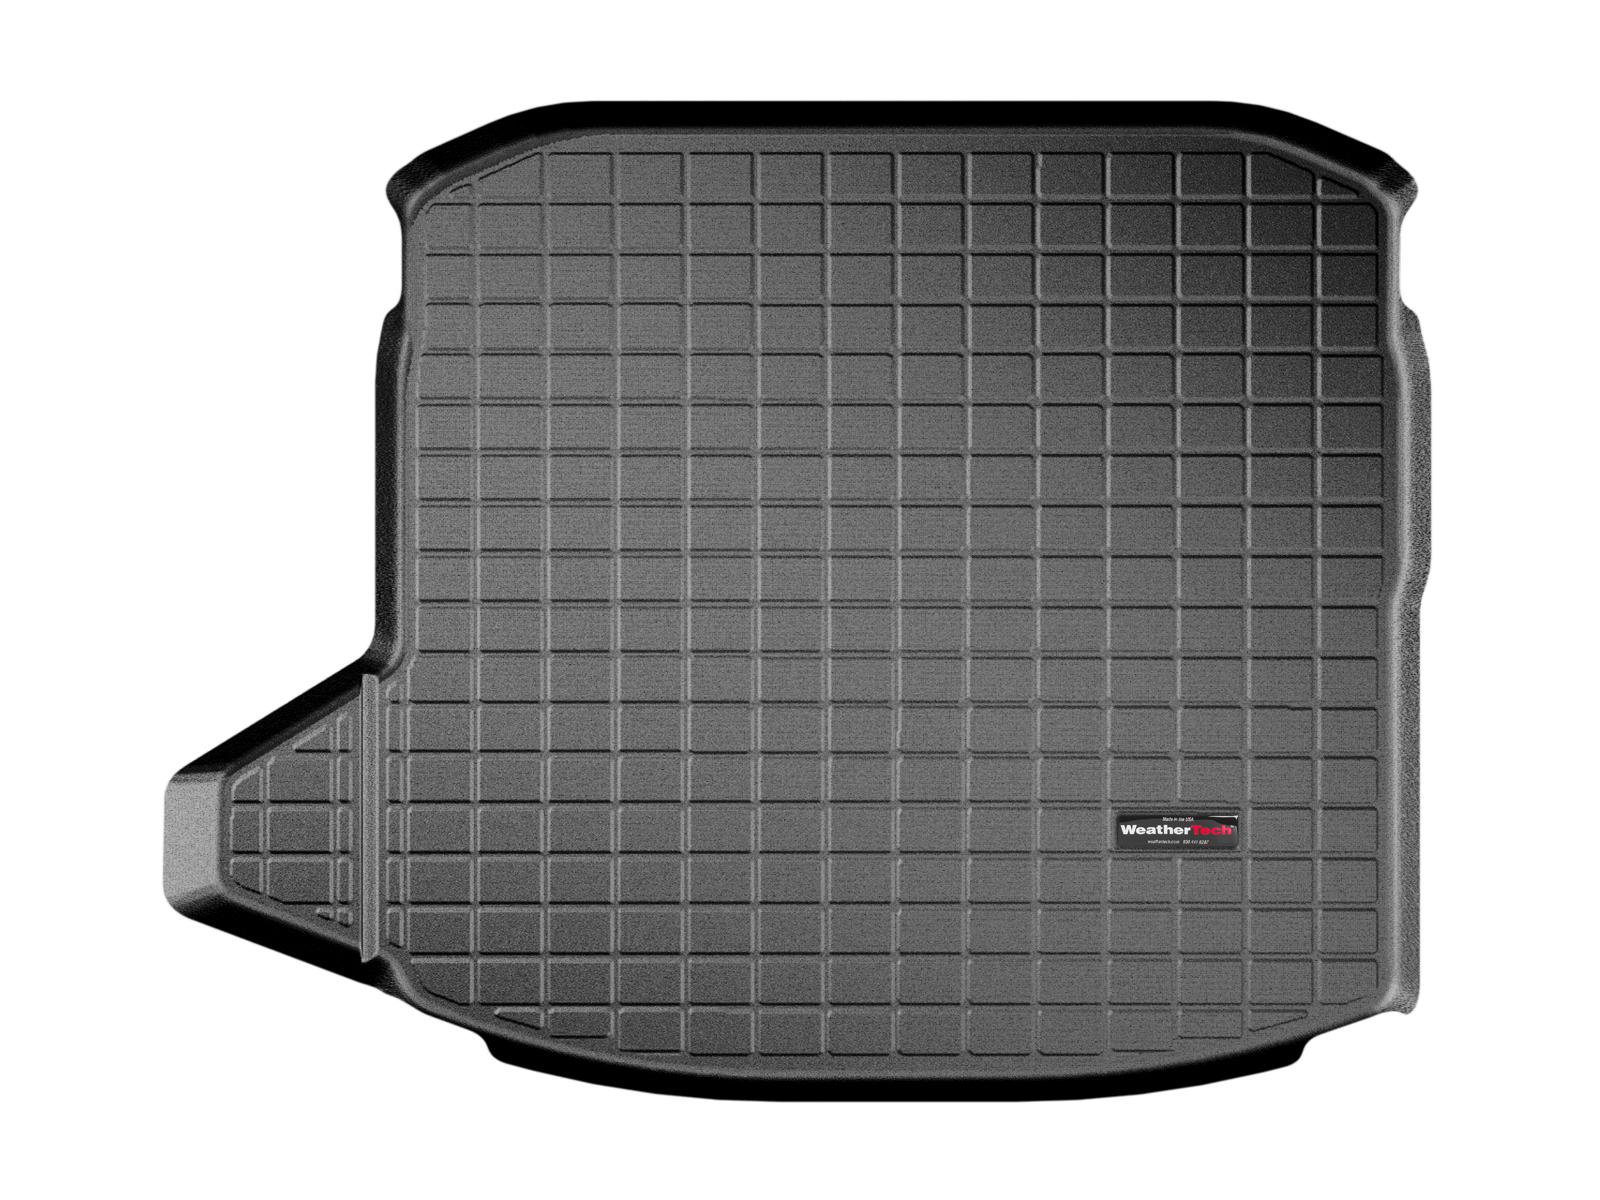 Audi A3 S3 2013>2017 Vasca proteggi baule tappeto bagagliaio nero *20